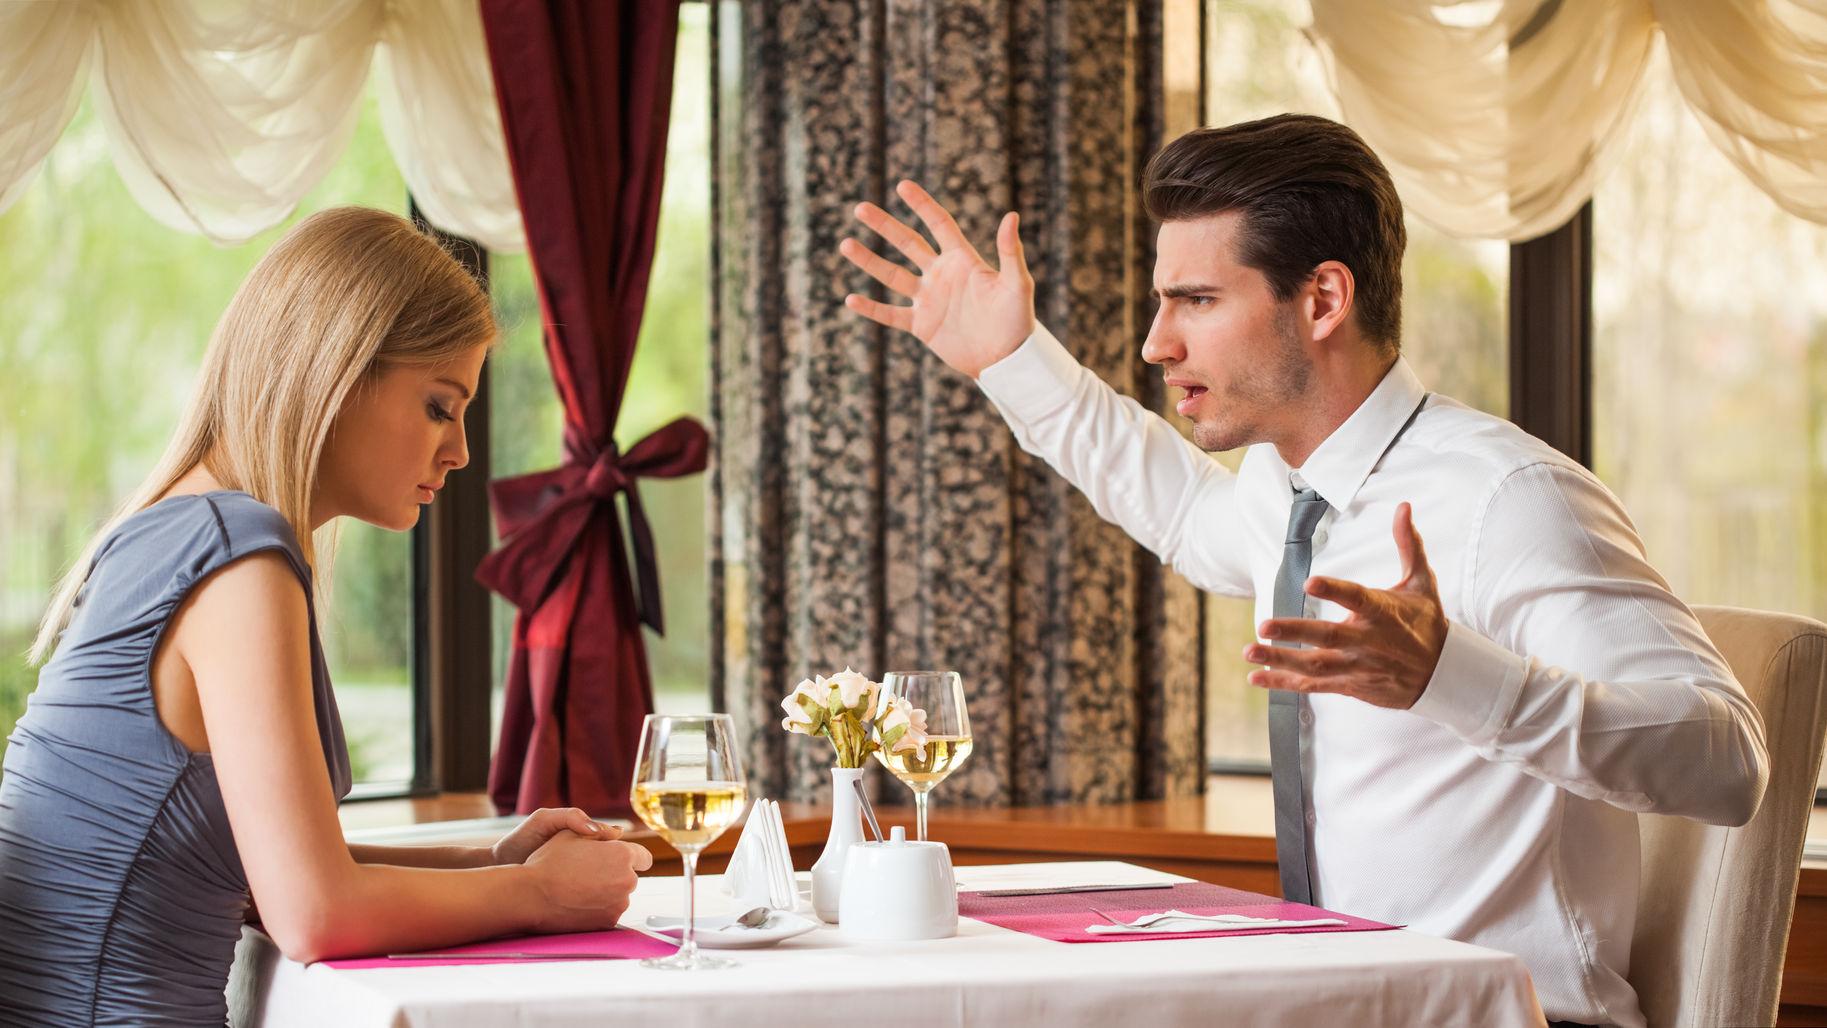 Man fight woman restaurant